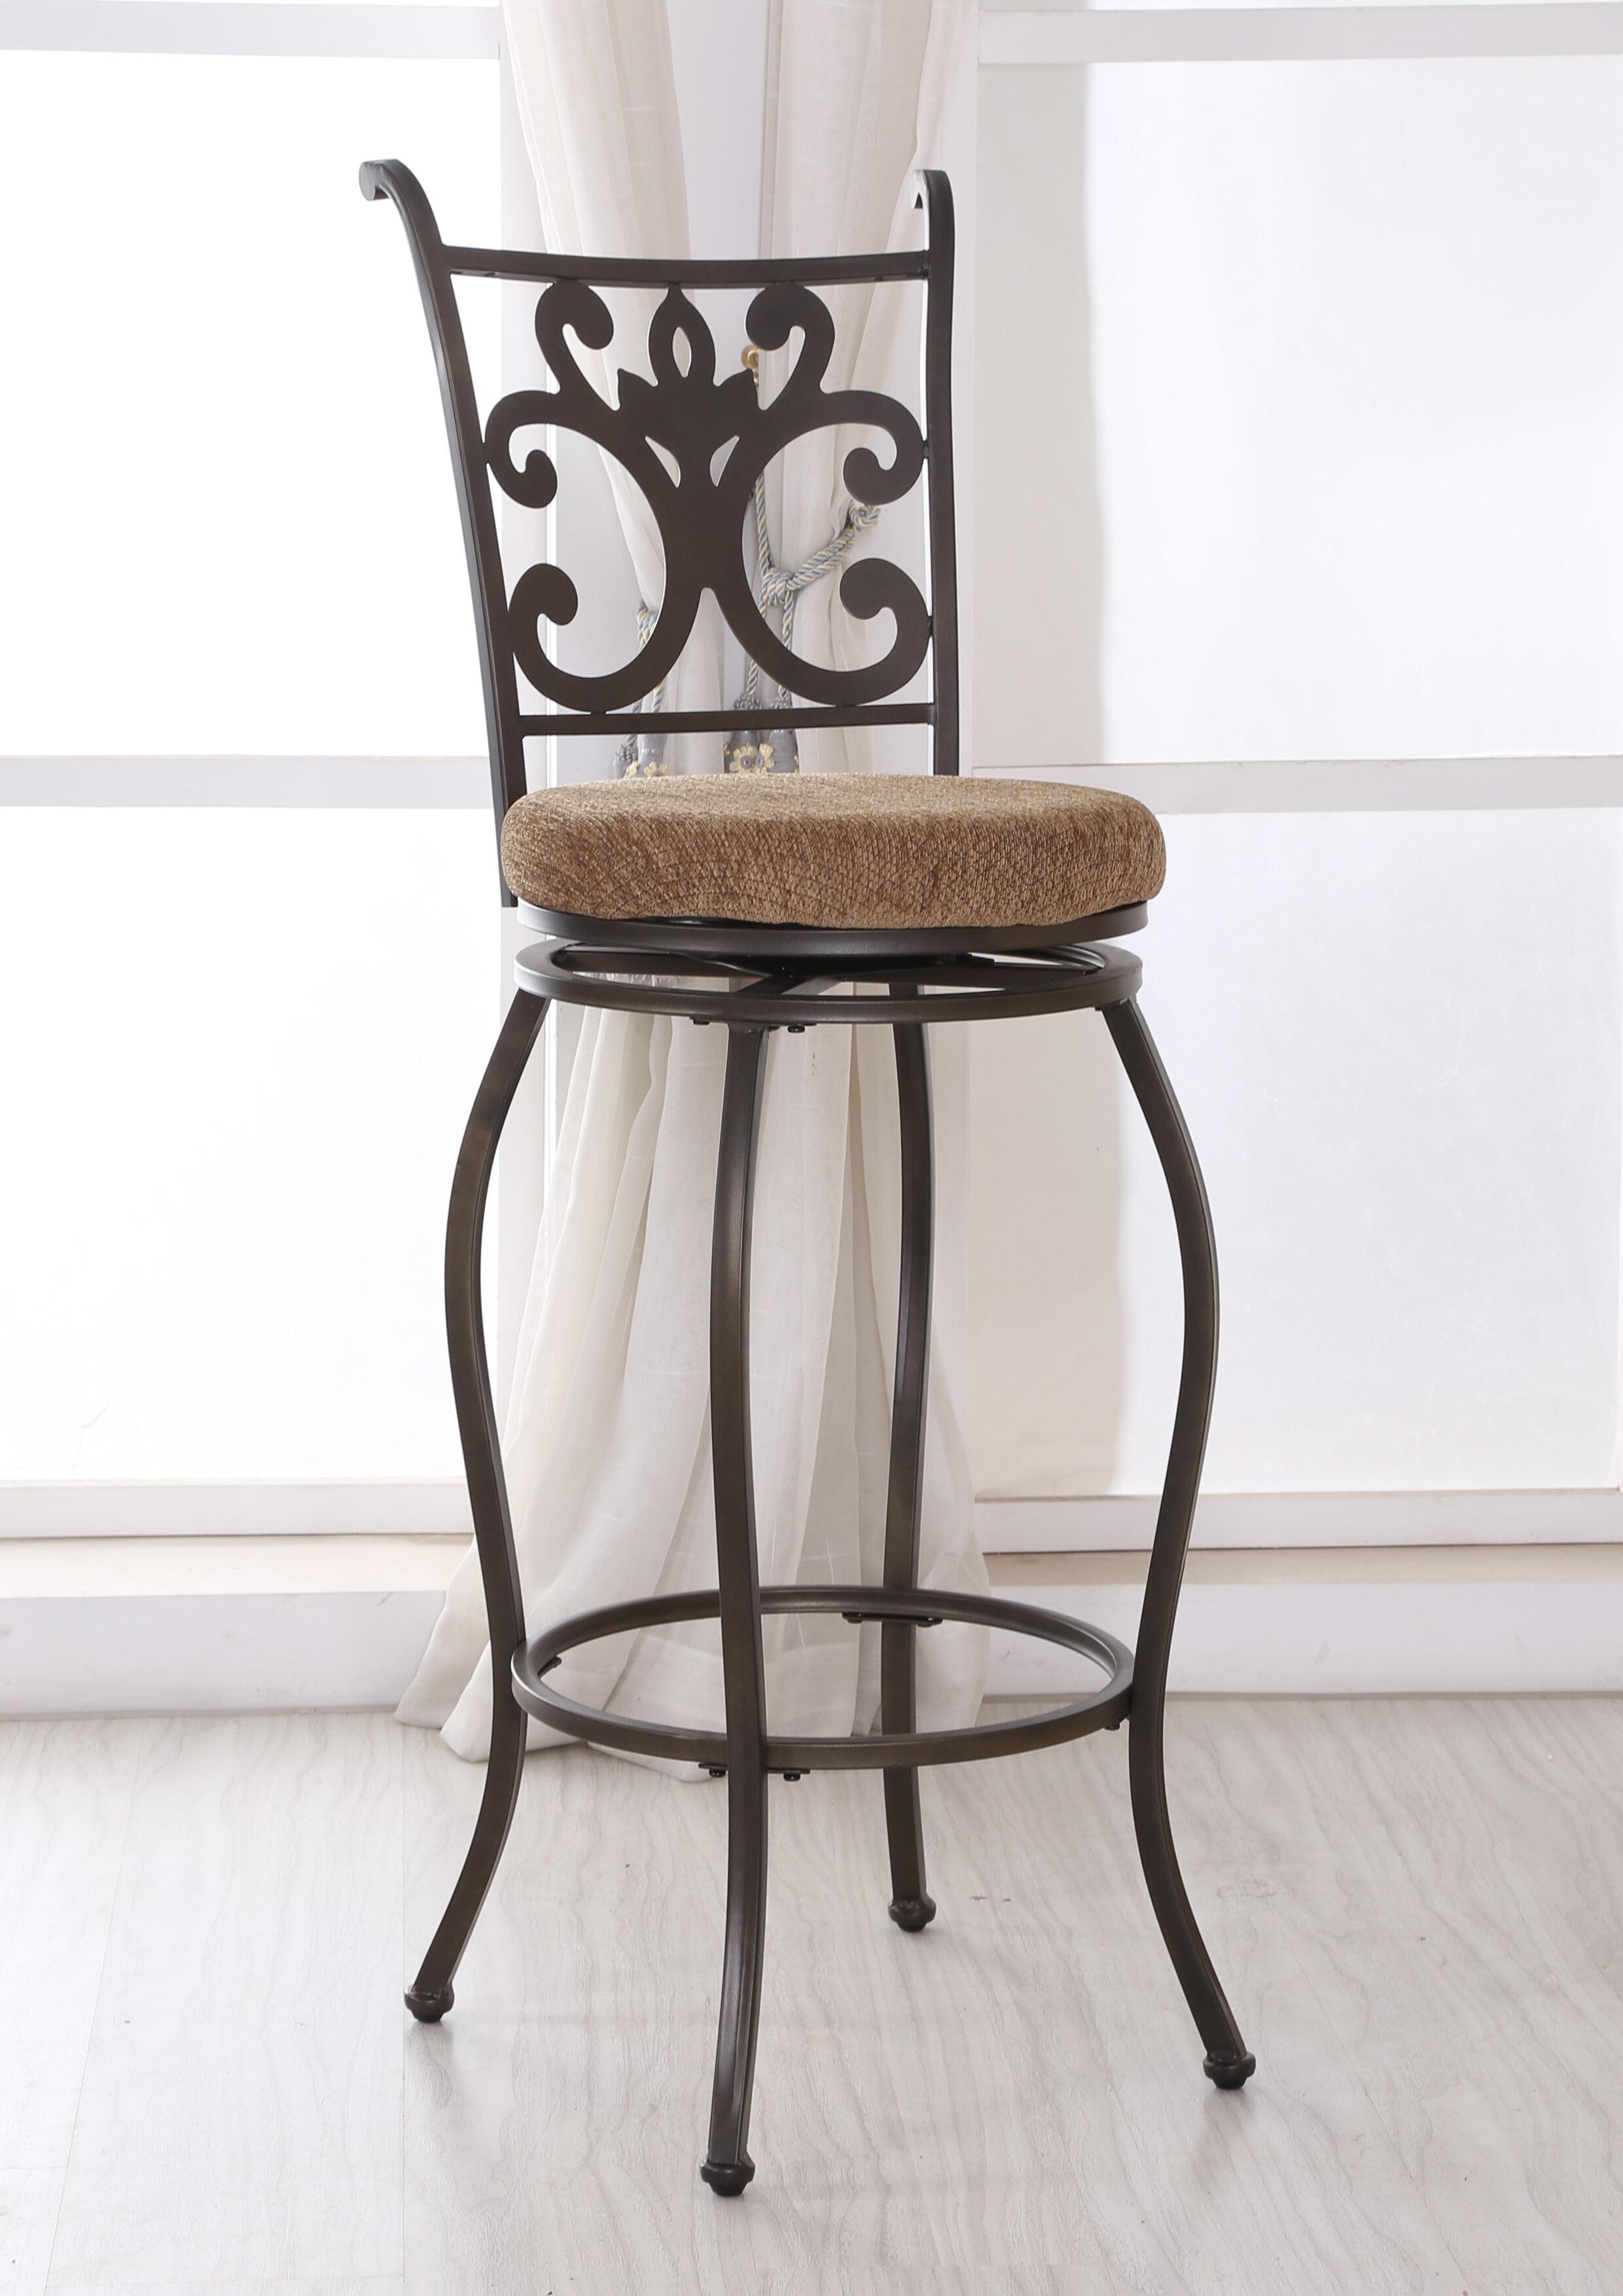 Swell Burbank Swivel Bar Stool Uwap Interior Chair Design Uwaporg